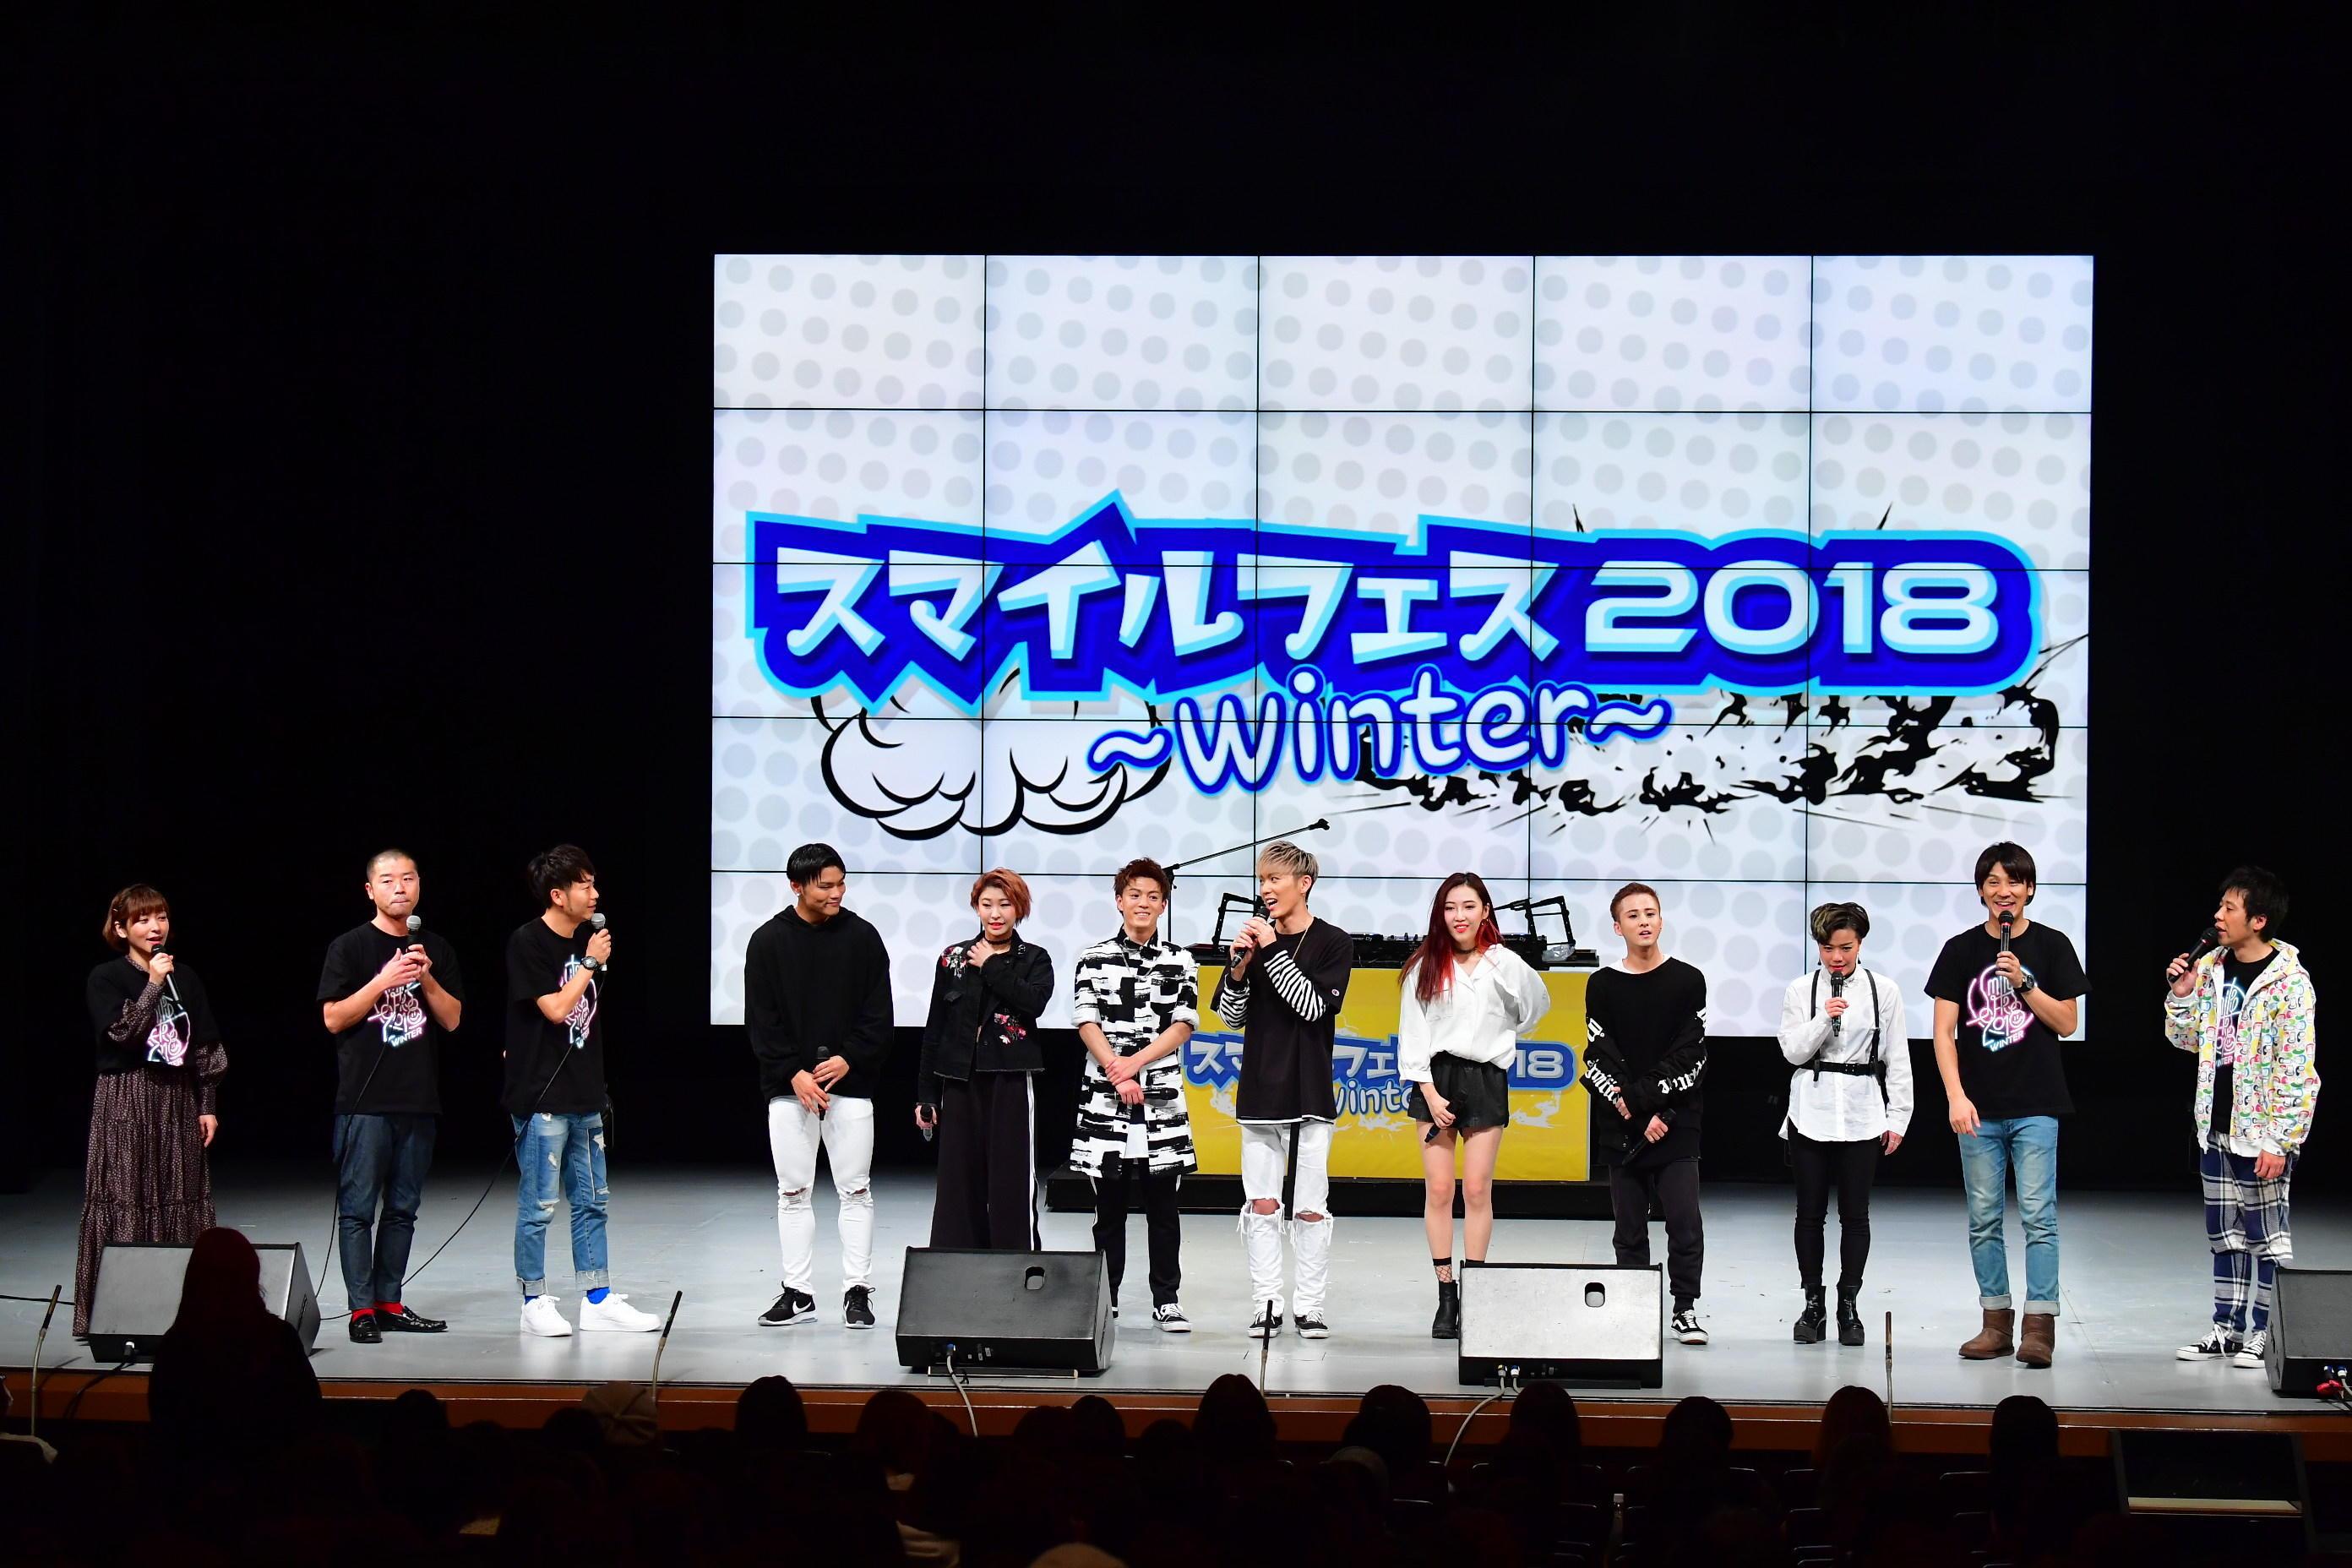 http://news.yoshimoto.co.jp/20180119011946-5133fef7e91a220c43359ac21a696fbbc89e52dd.jpg